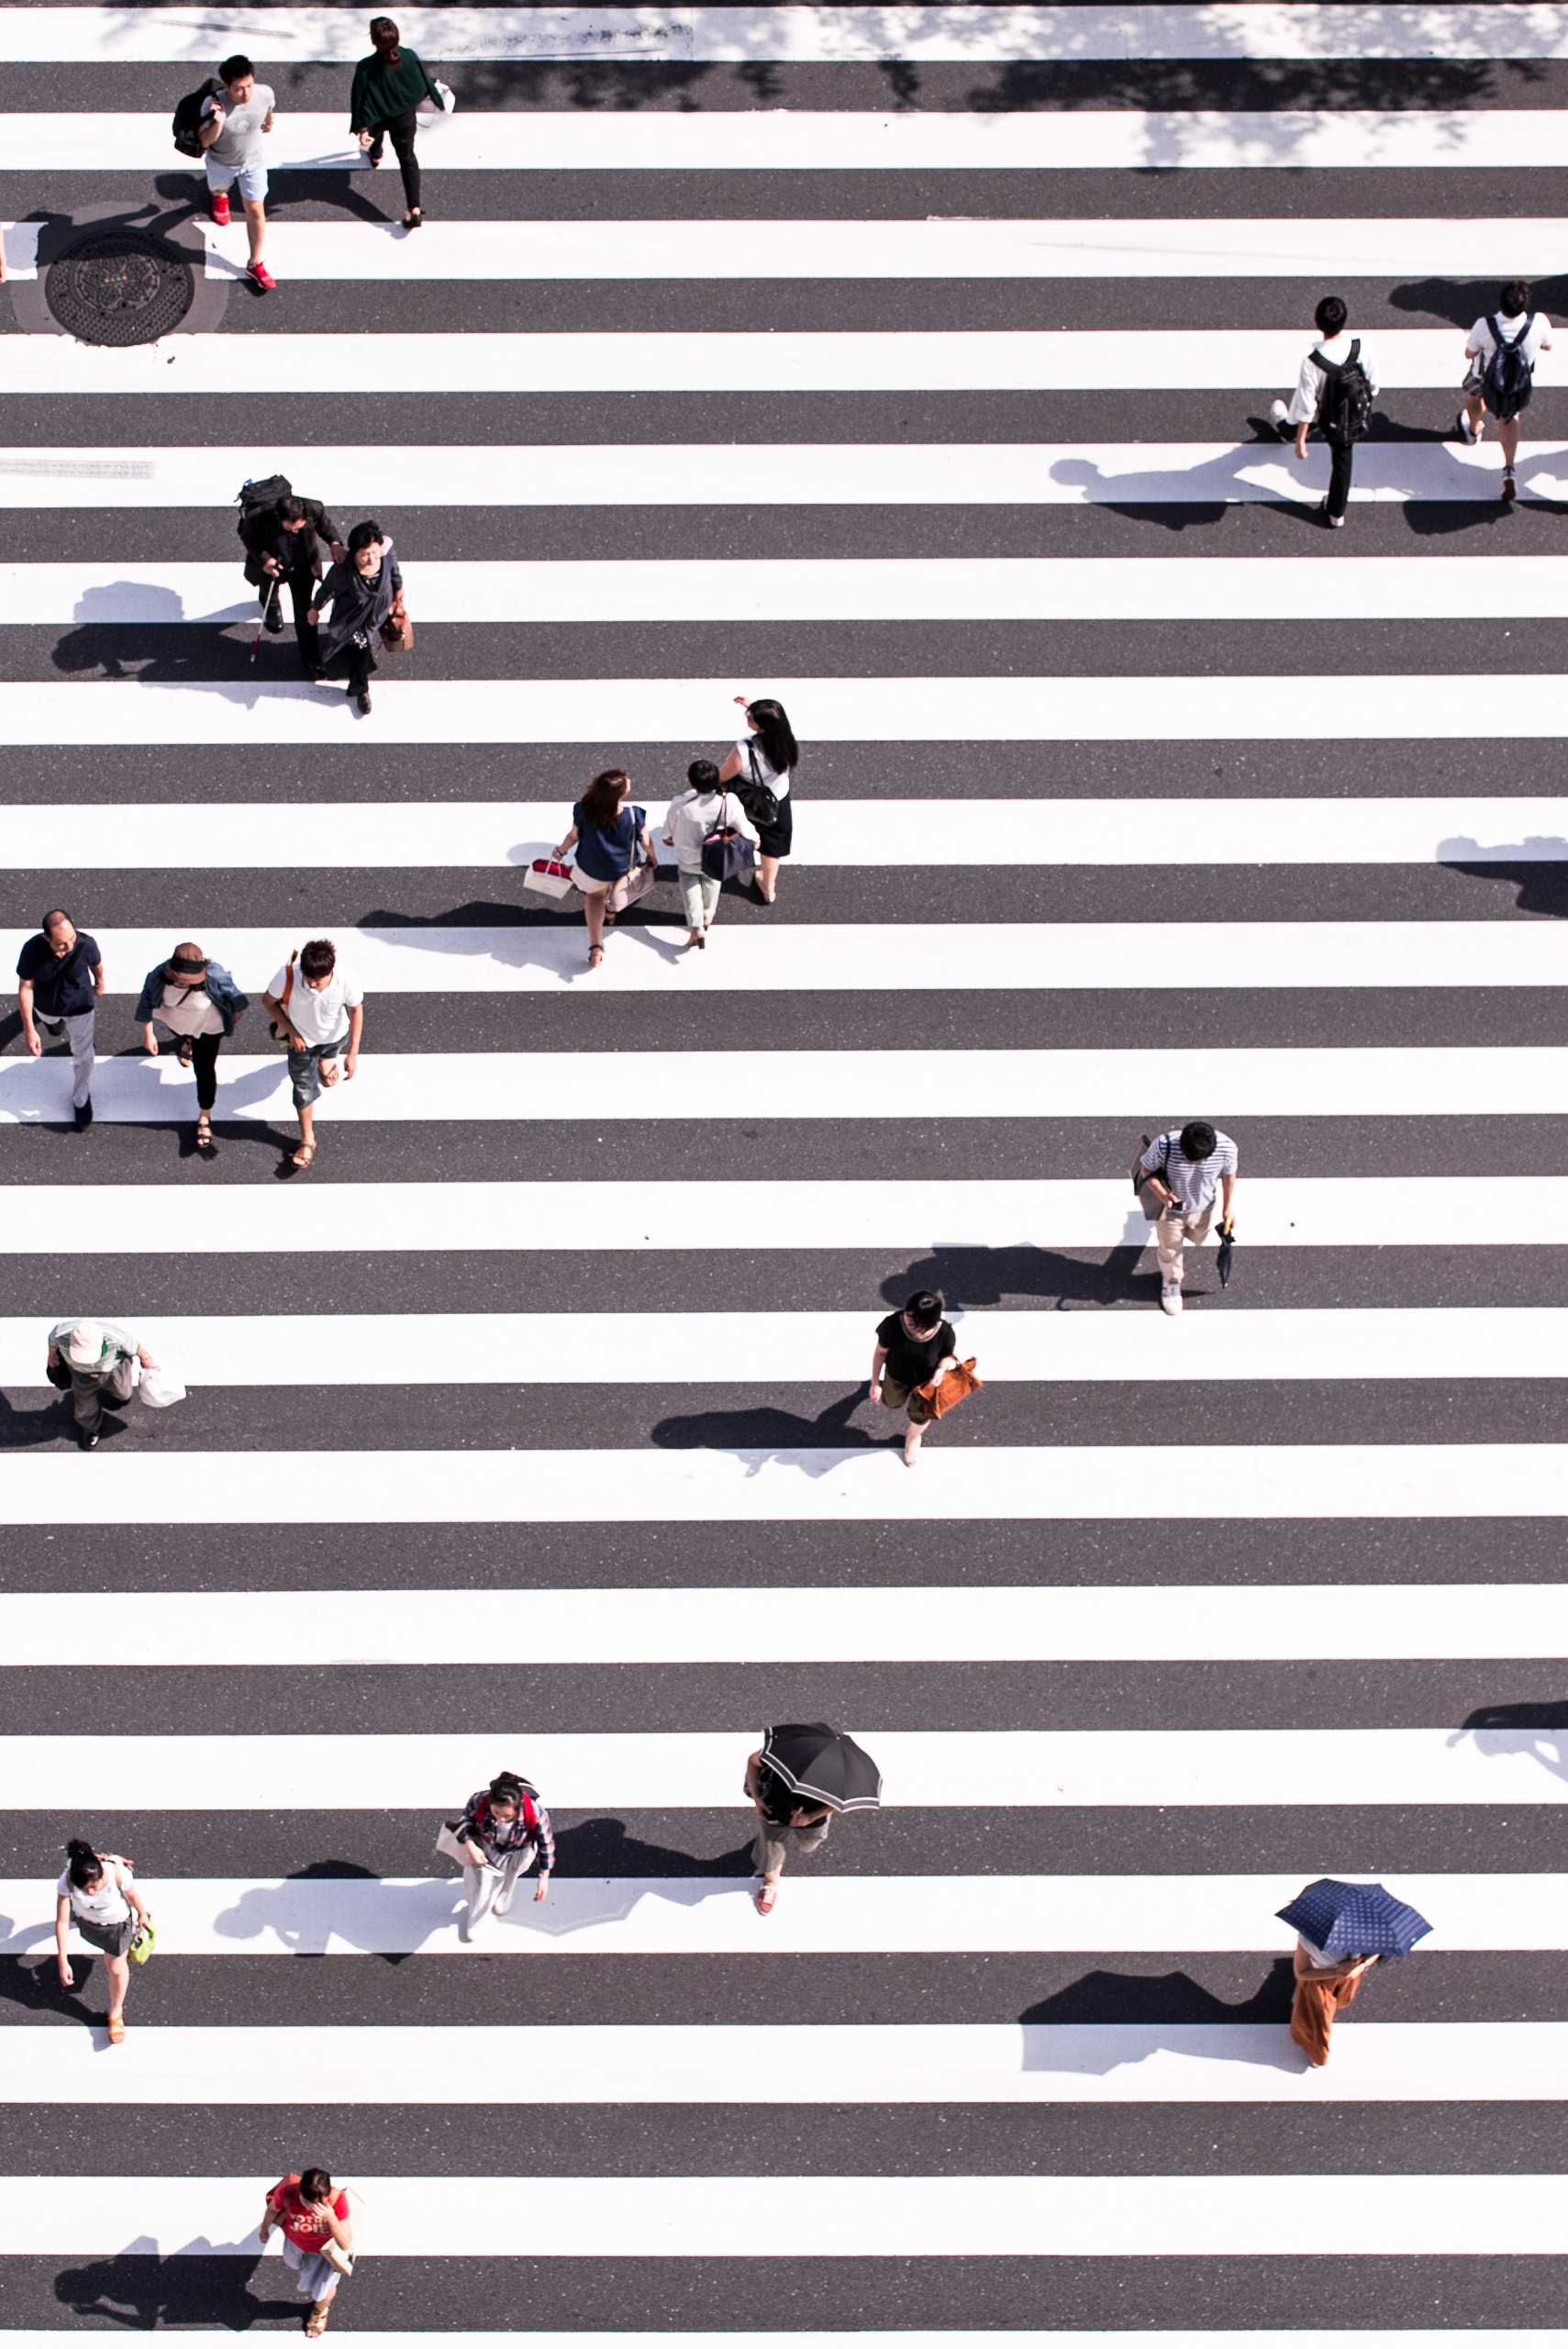 Photo by  Ryoji Iwata